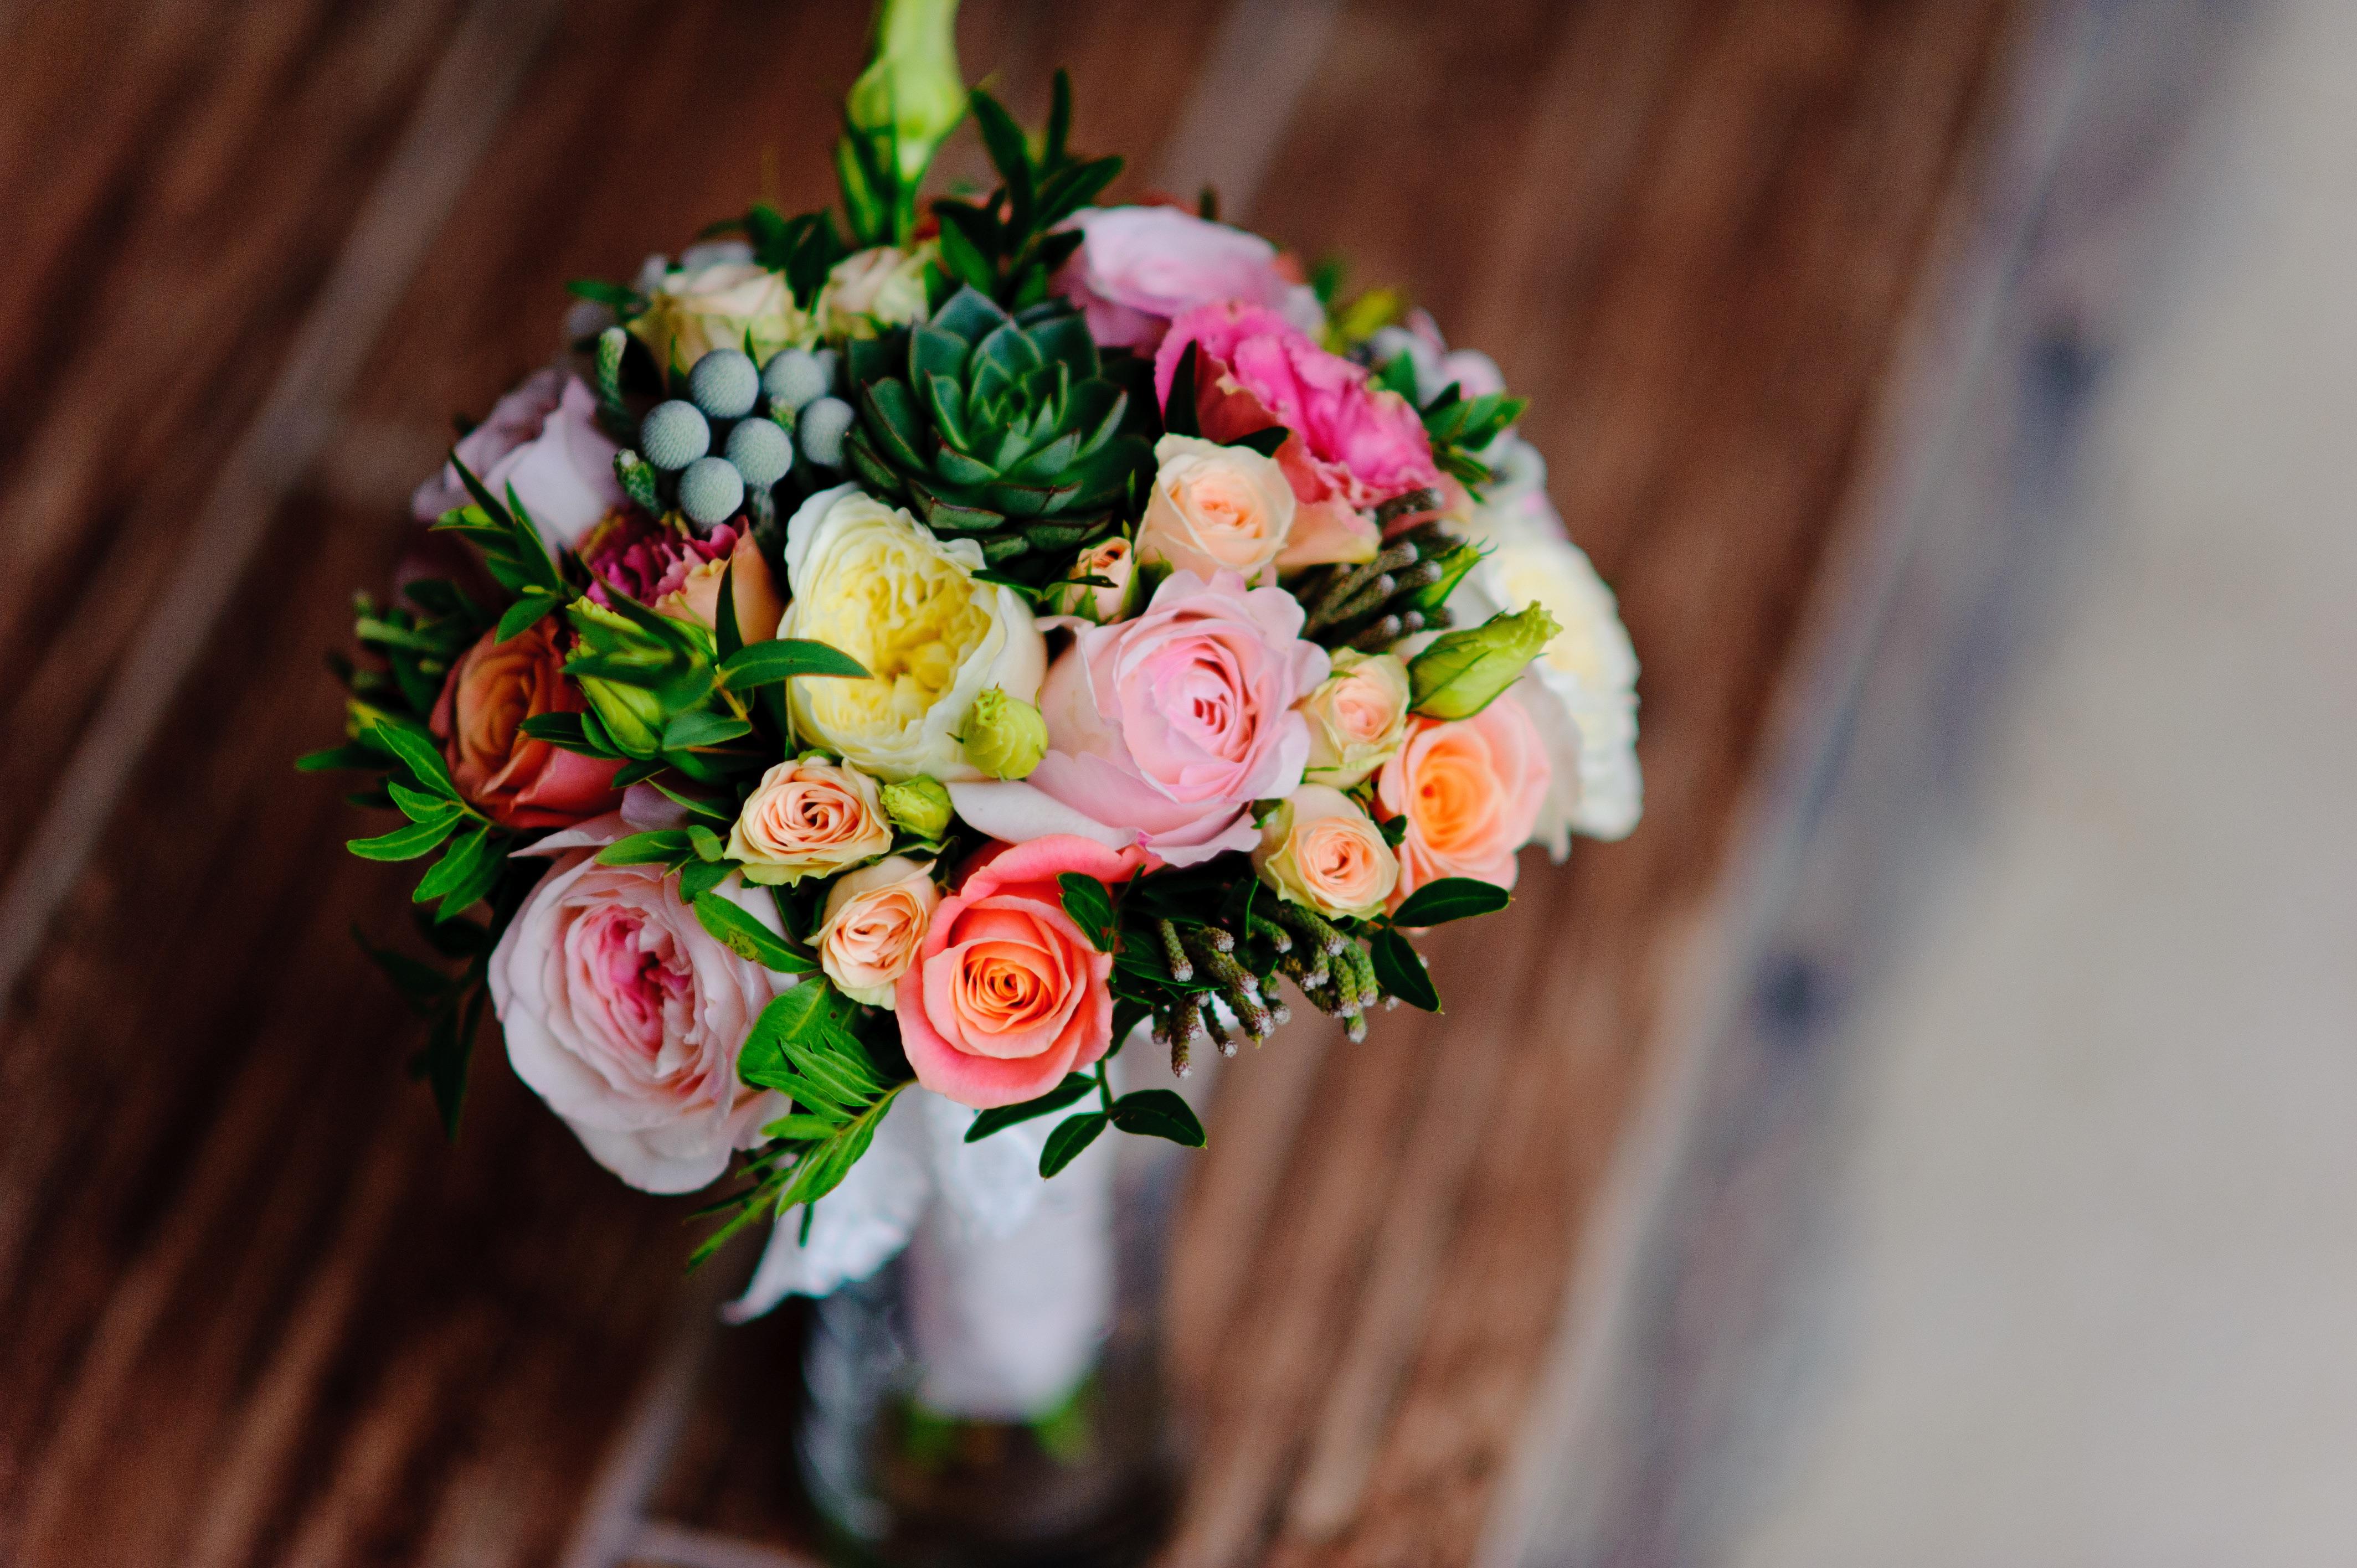 Free images blossom petal spring pink wedding flora roses blossom plant flower petal bouquet spring pink wedding flora roses wood table ceremony floristry flowering plant izmirmasajfo Images